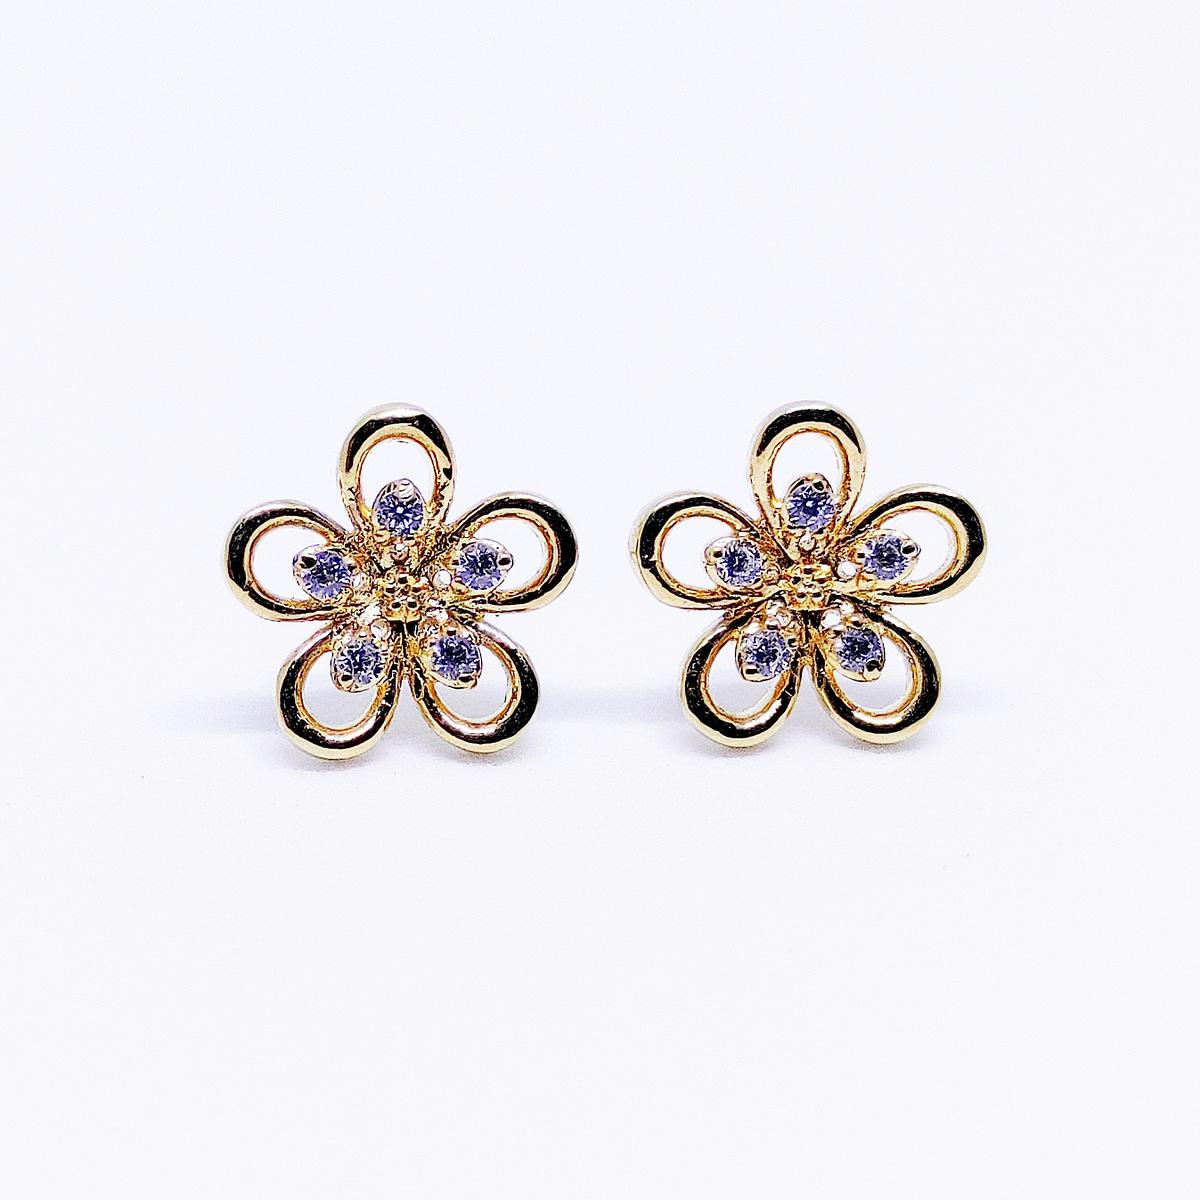 BLOSSOM - Flower Shaped Earrings - Yellow